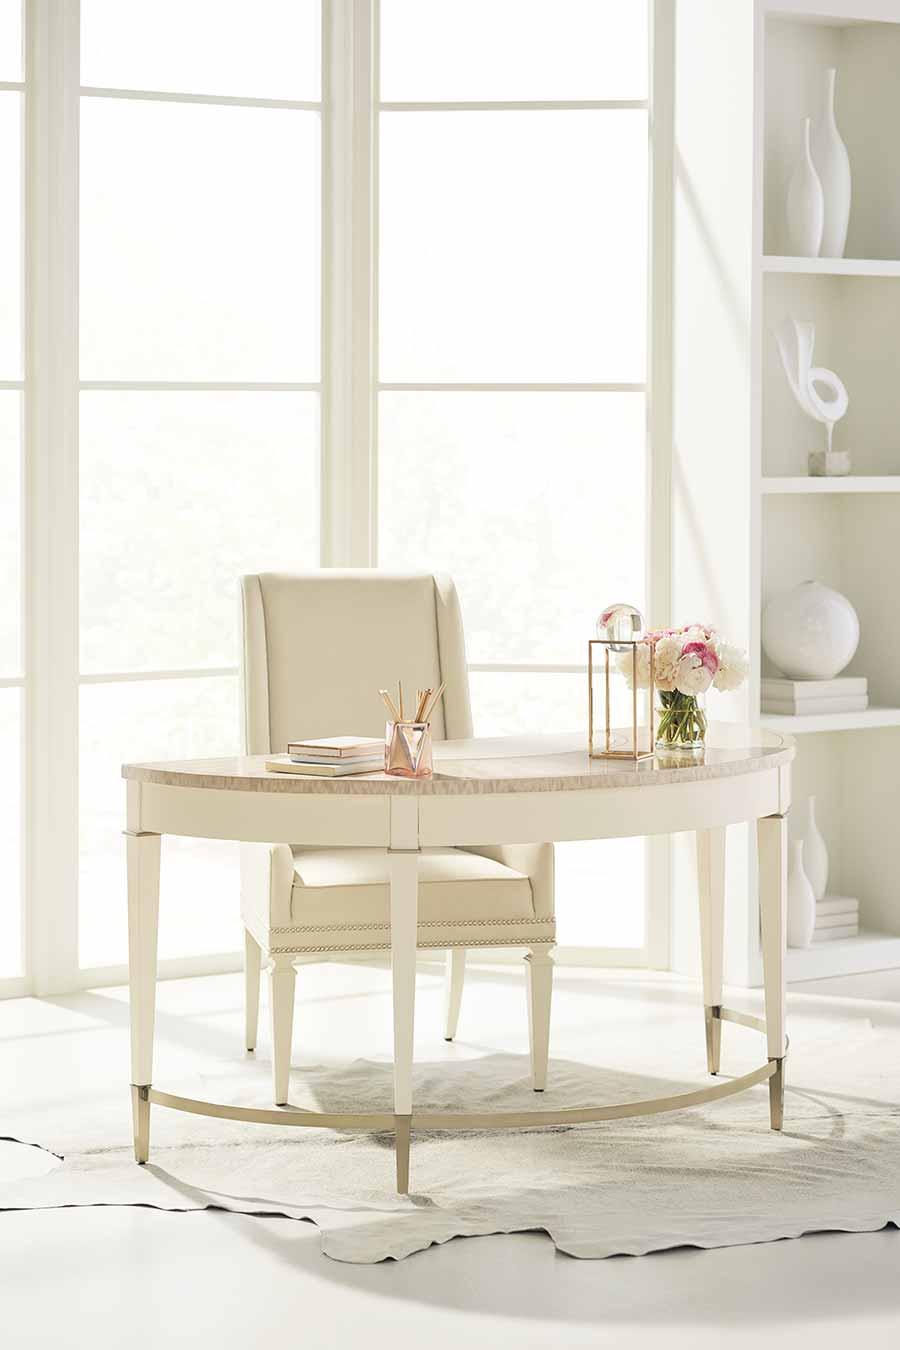 Half the Time Desk | Place Direct | Contemporary Luxury Exclusive Designer Modern High End Furniture | Sandton Johannesburg